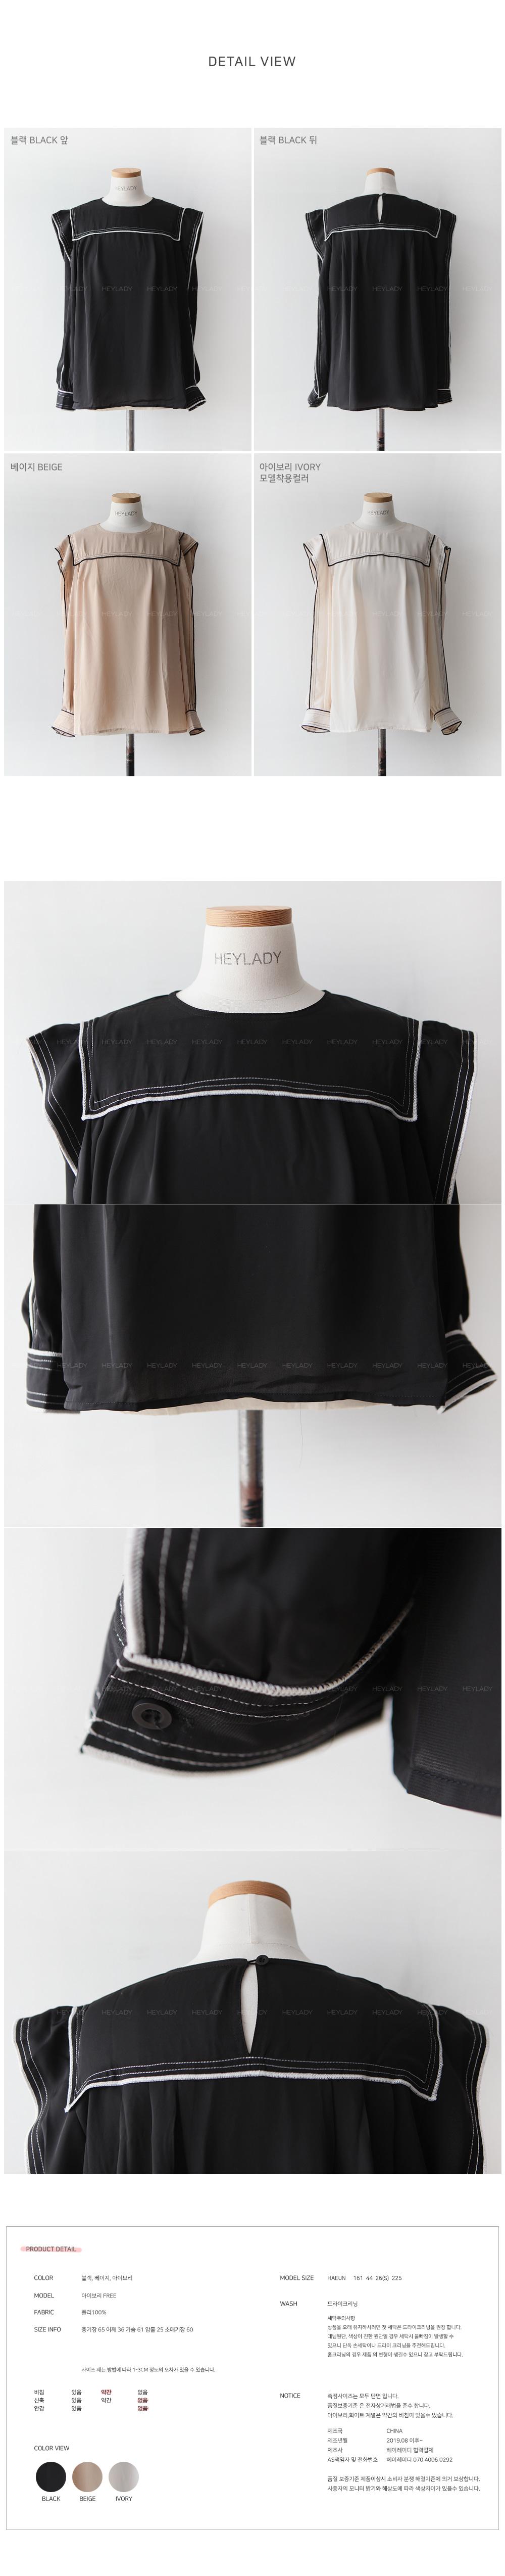 Enna stitch blouse